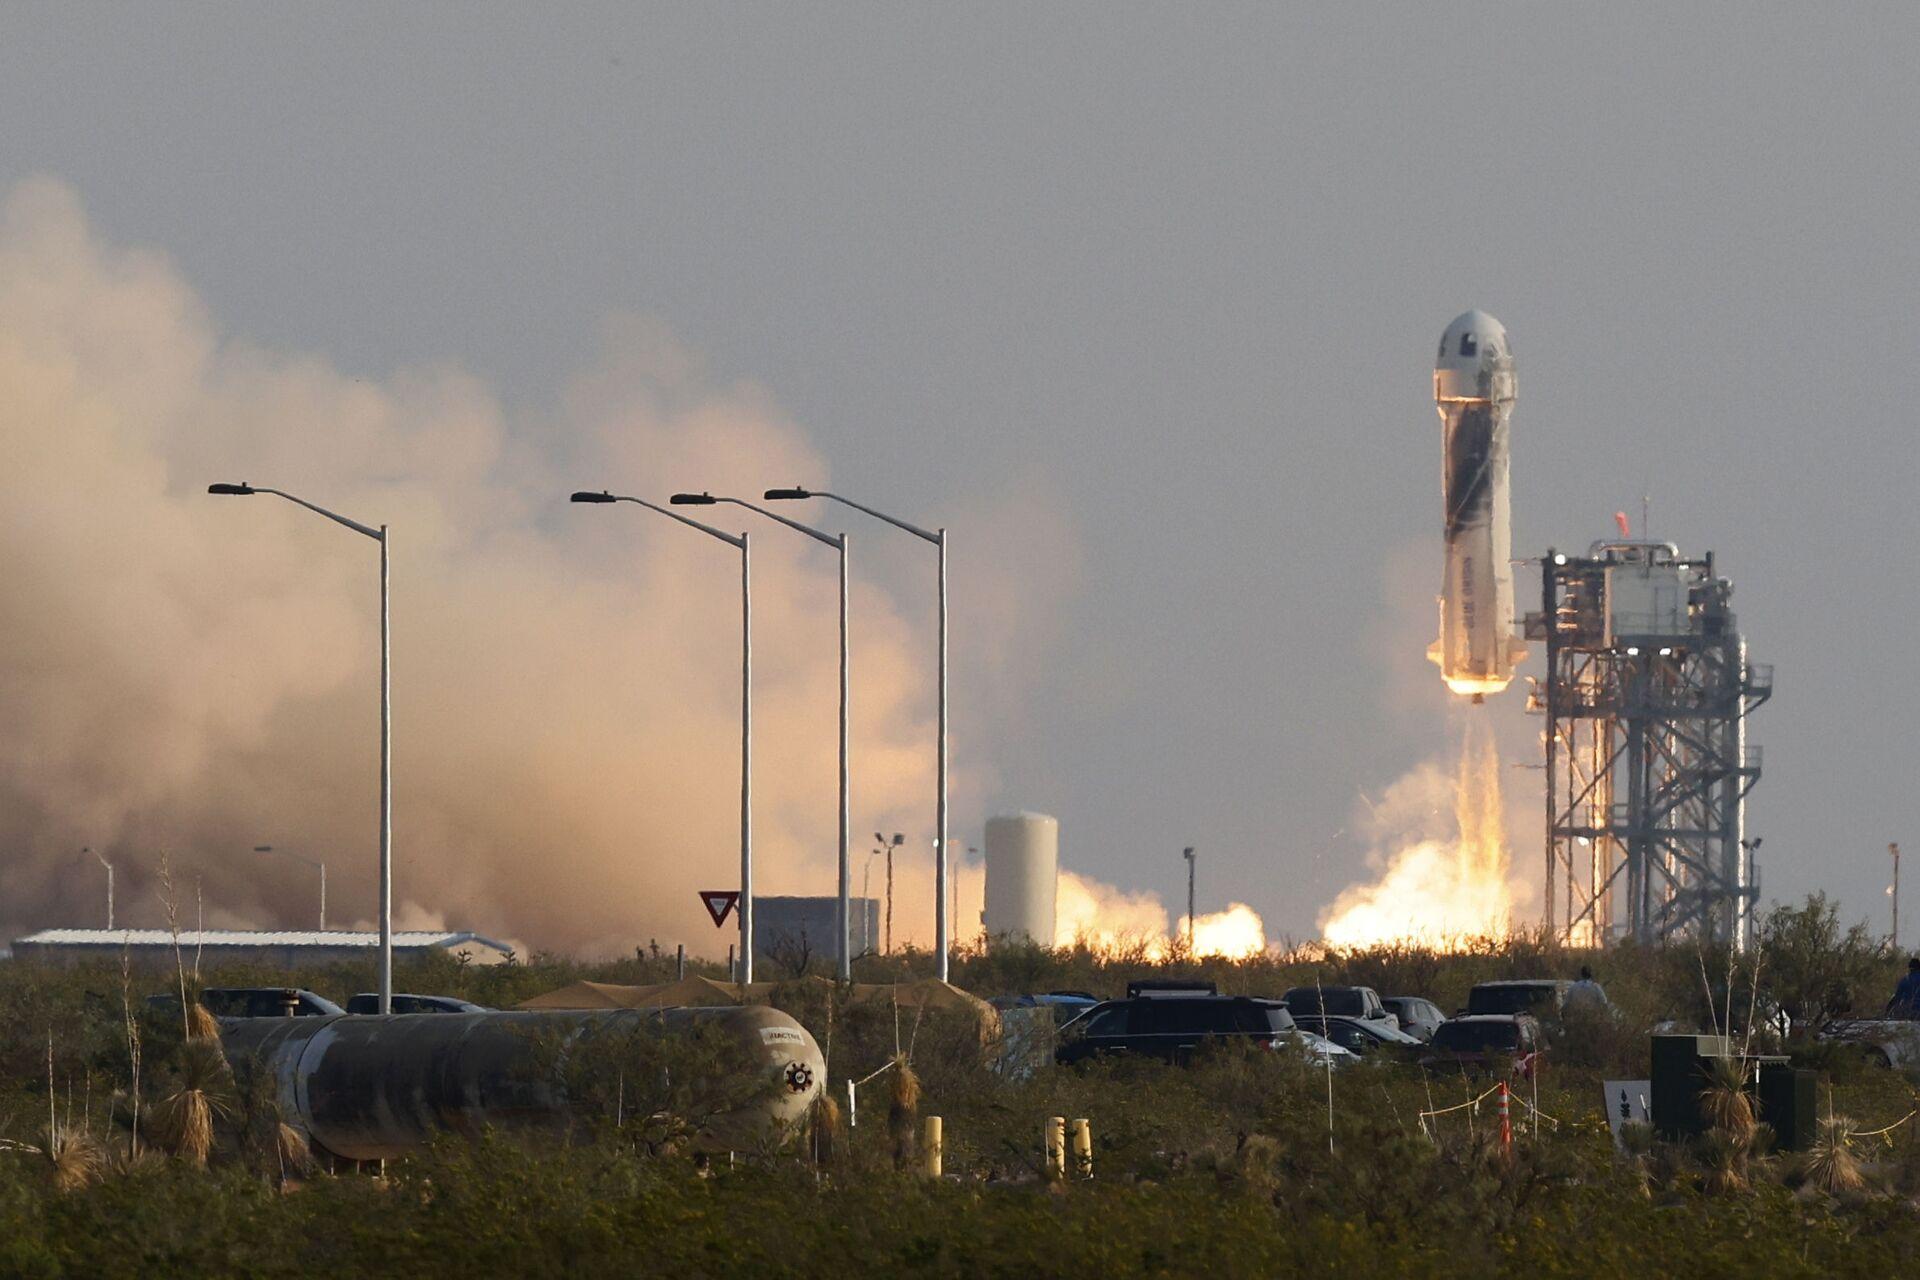 Billionaire businessman Jeff Bezos is launched with three crew members aboard a New Shepard rocket on the world's first unpiloted suborbital flight from Blue Origin's Launch Site 1 near Van Horn, Texas , U.S., July 20, 2021 - Sputnik International, 1920, 07.09.2021